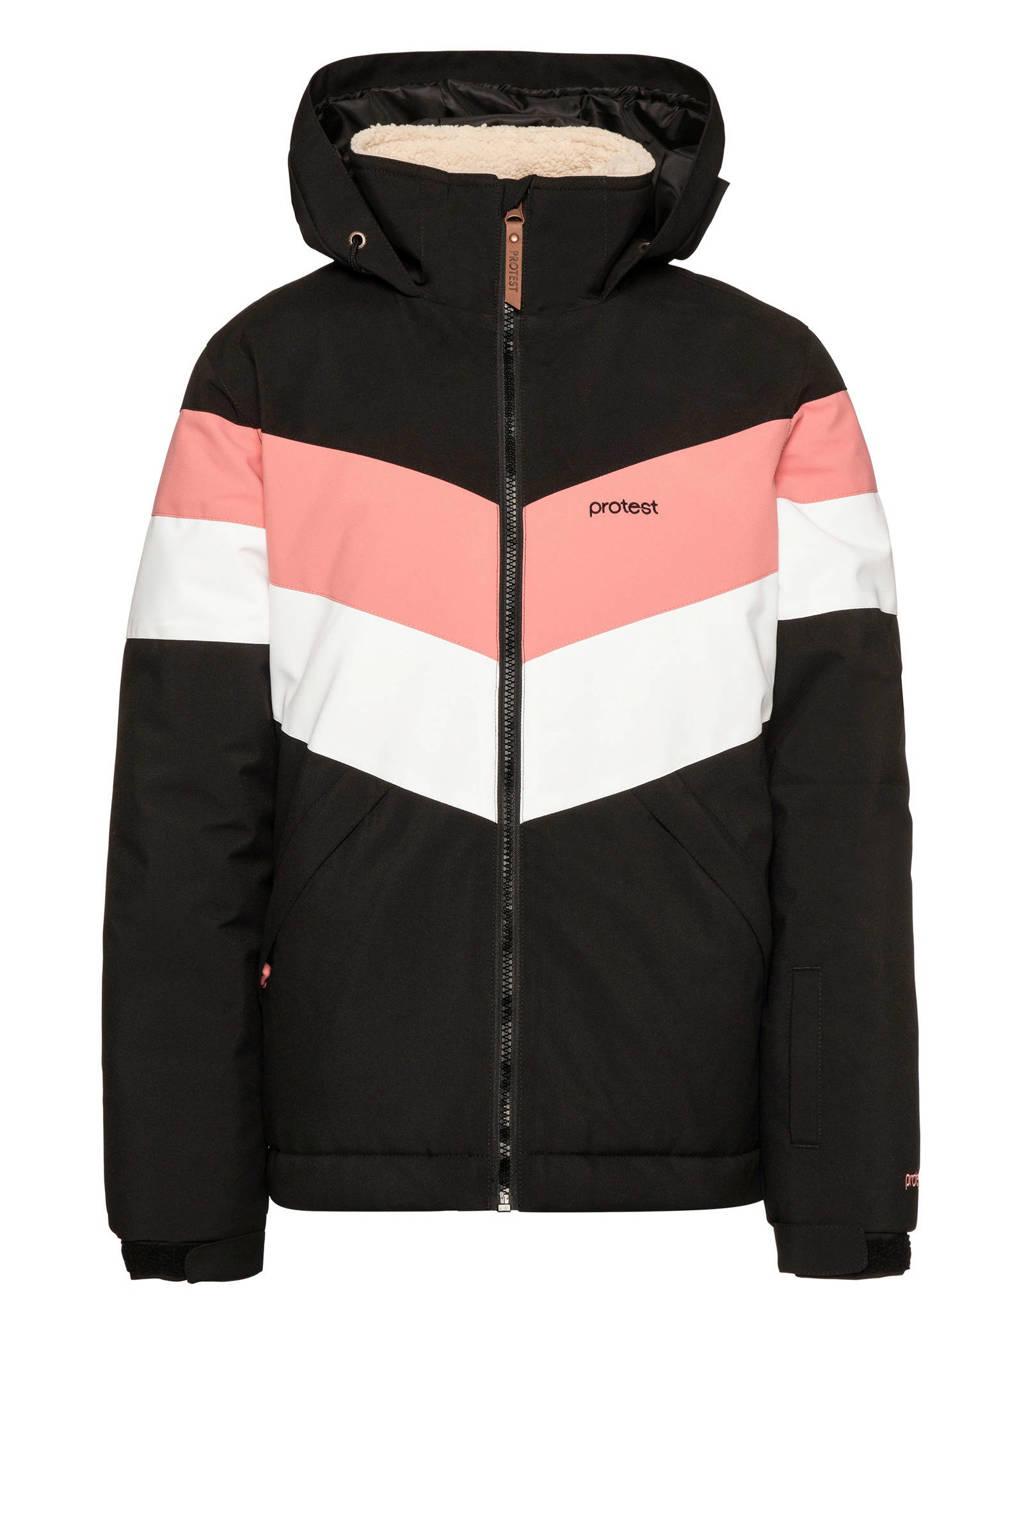 Protest Fudge JR ski-jack, Zwart/roze/wit